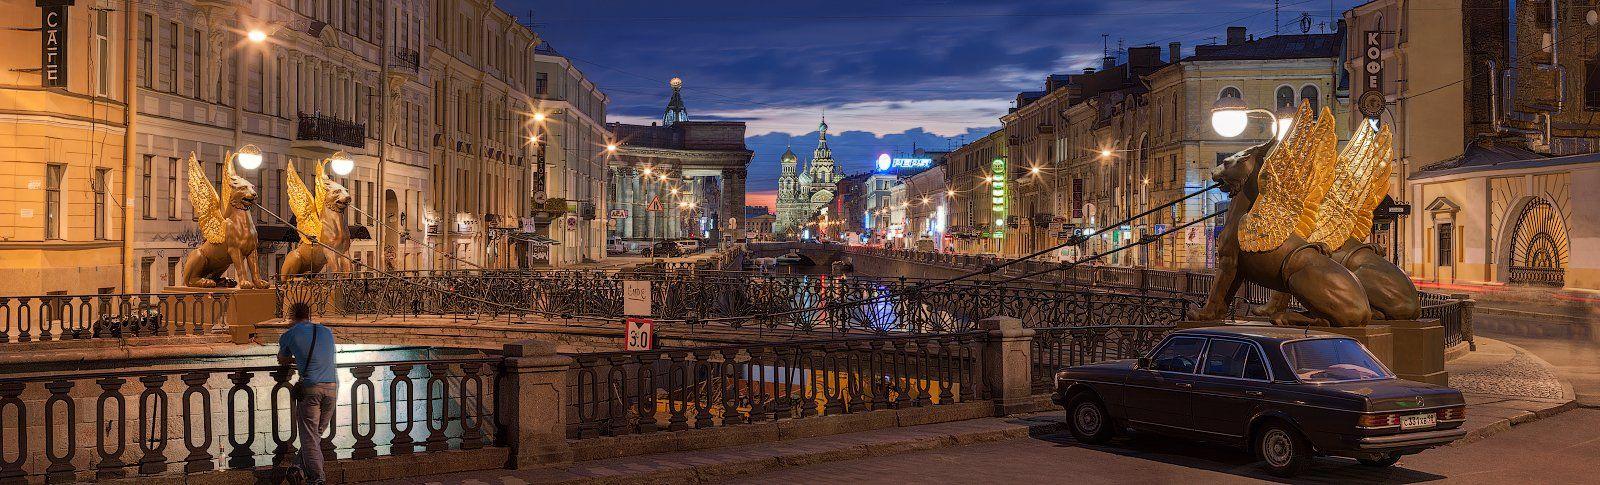 2009, Банковский, Белые ночи, Мост, Панорама, Санкт-петербург, Sergey Louks